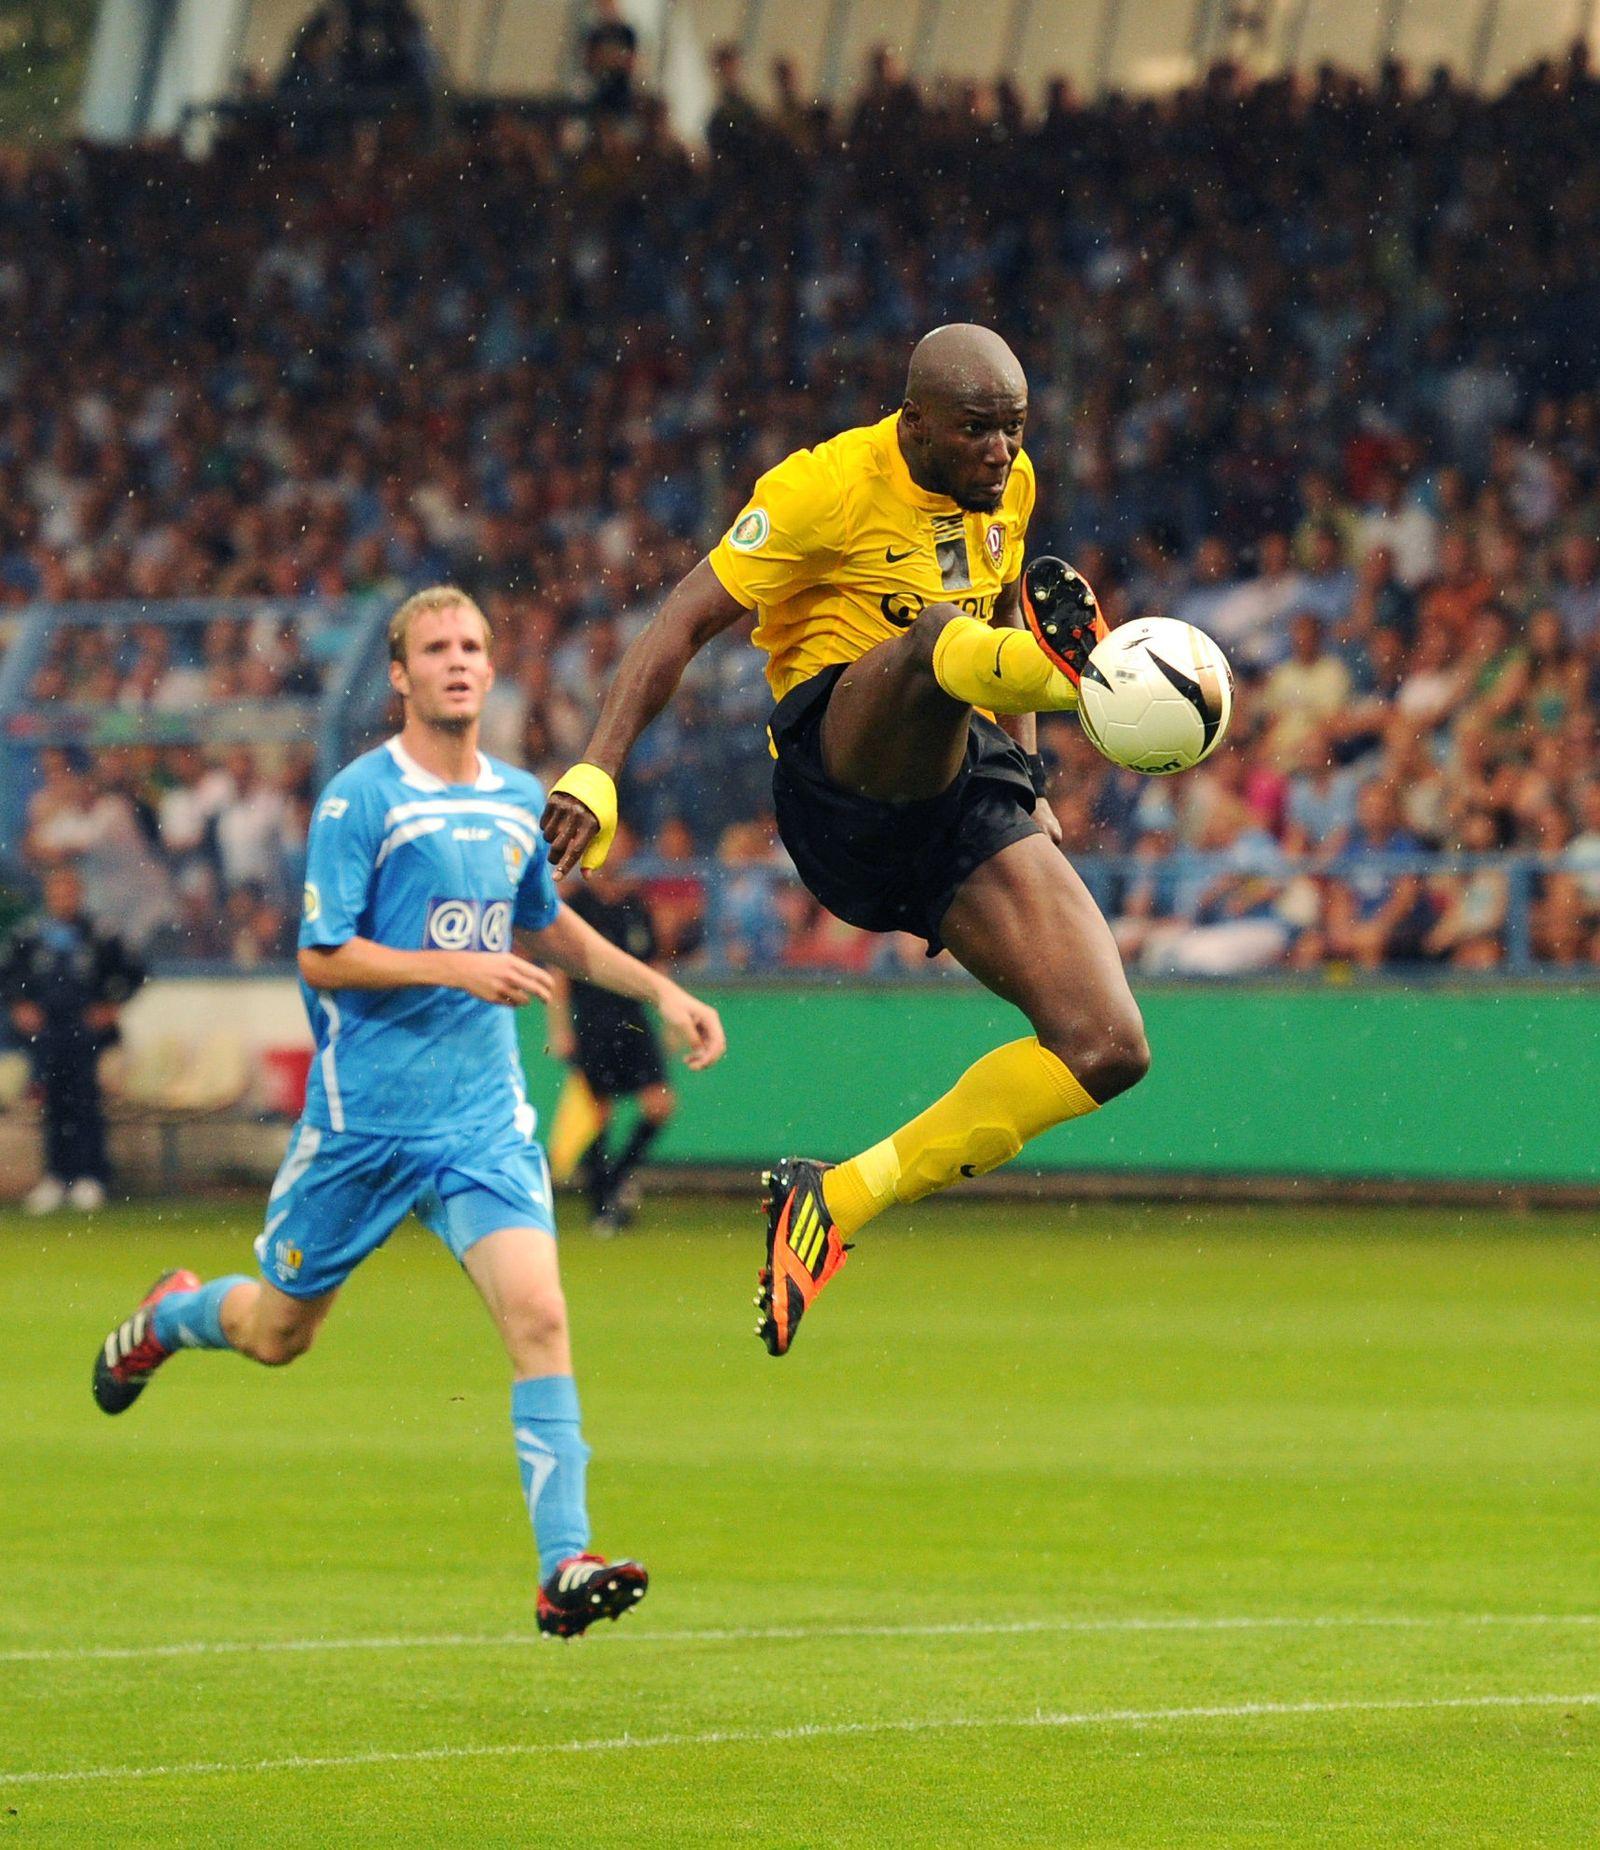 Chemnitzer FC - Dynamo Dresden